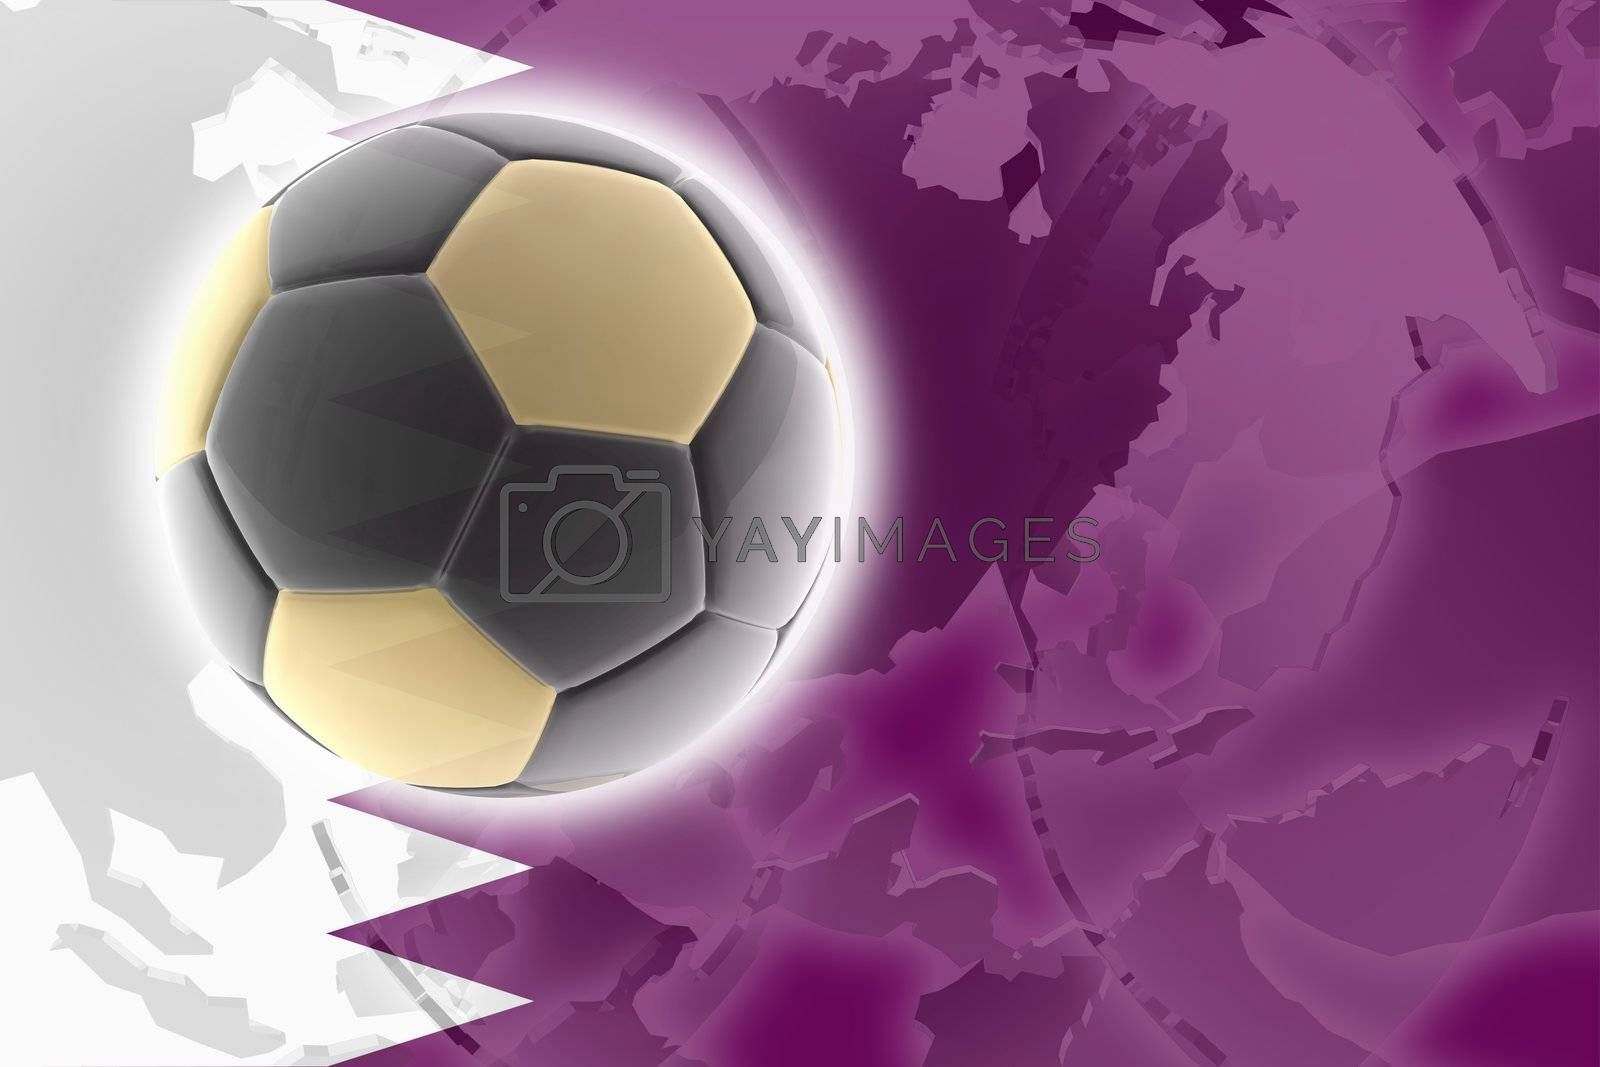 Flag of Qatar, national country symbol illustration sports soccer football